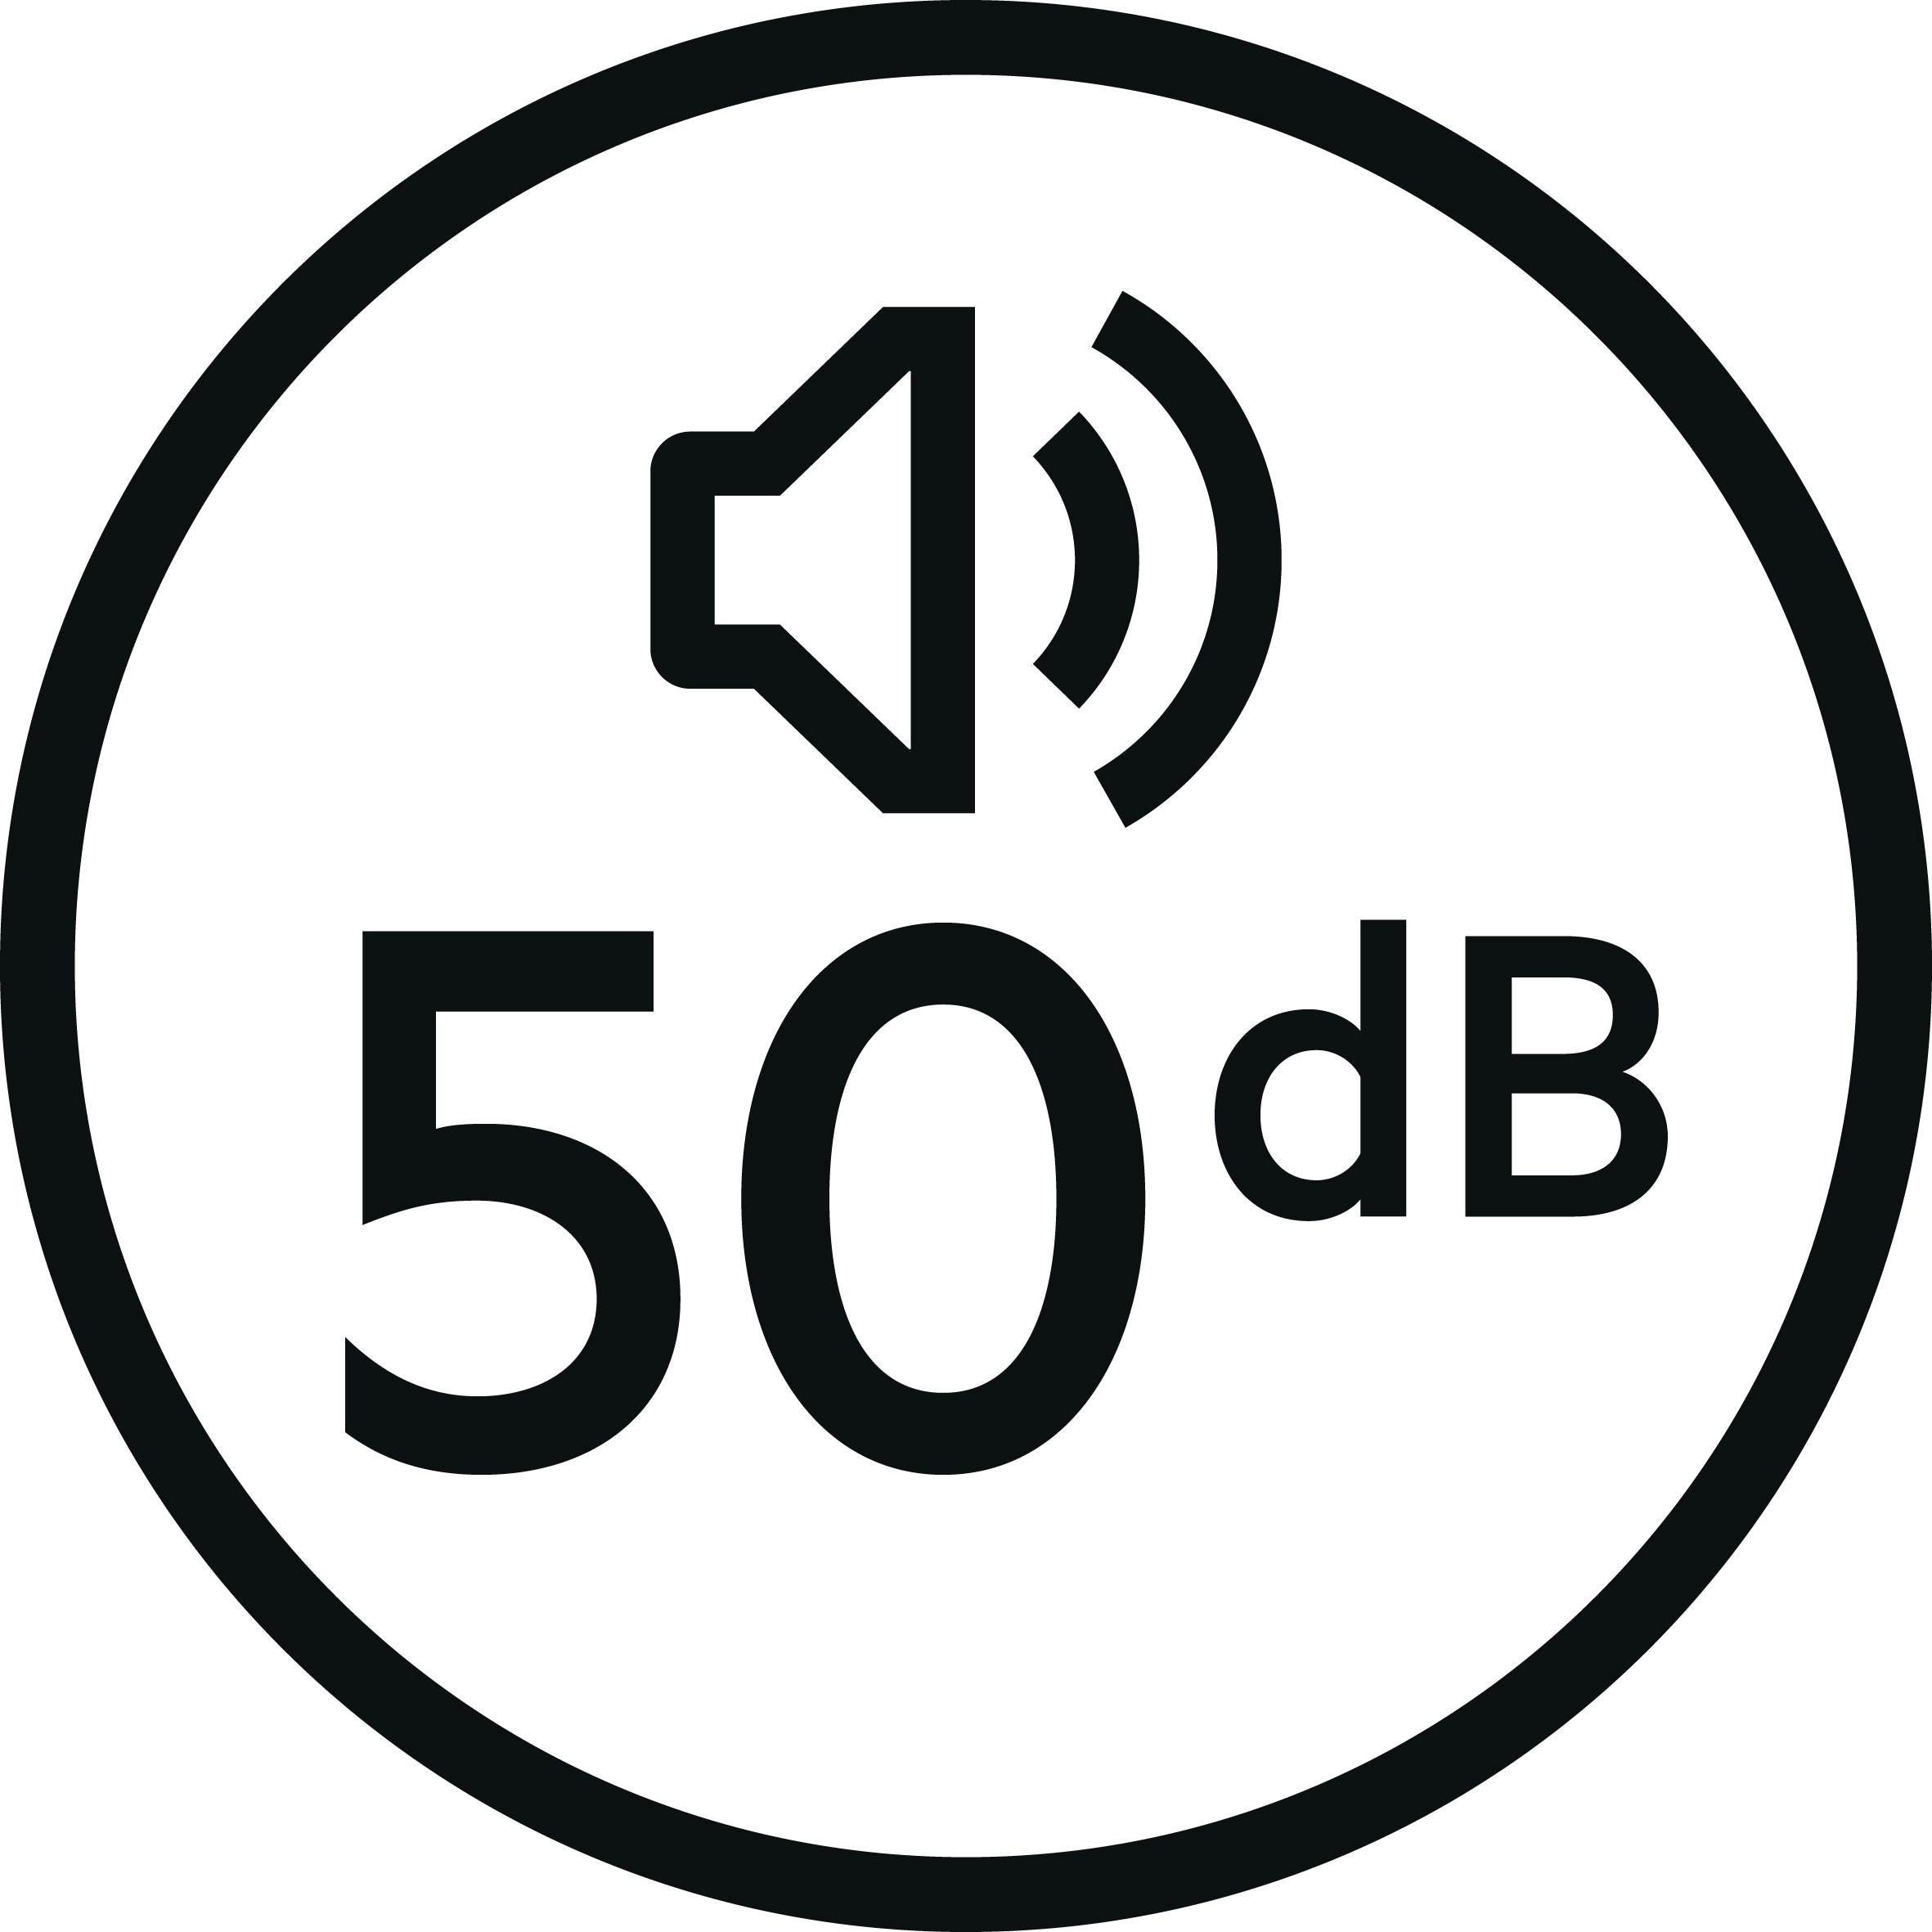 50dB-PSAAAP16PC569041.jpg